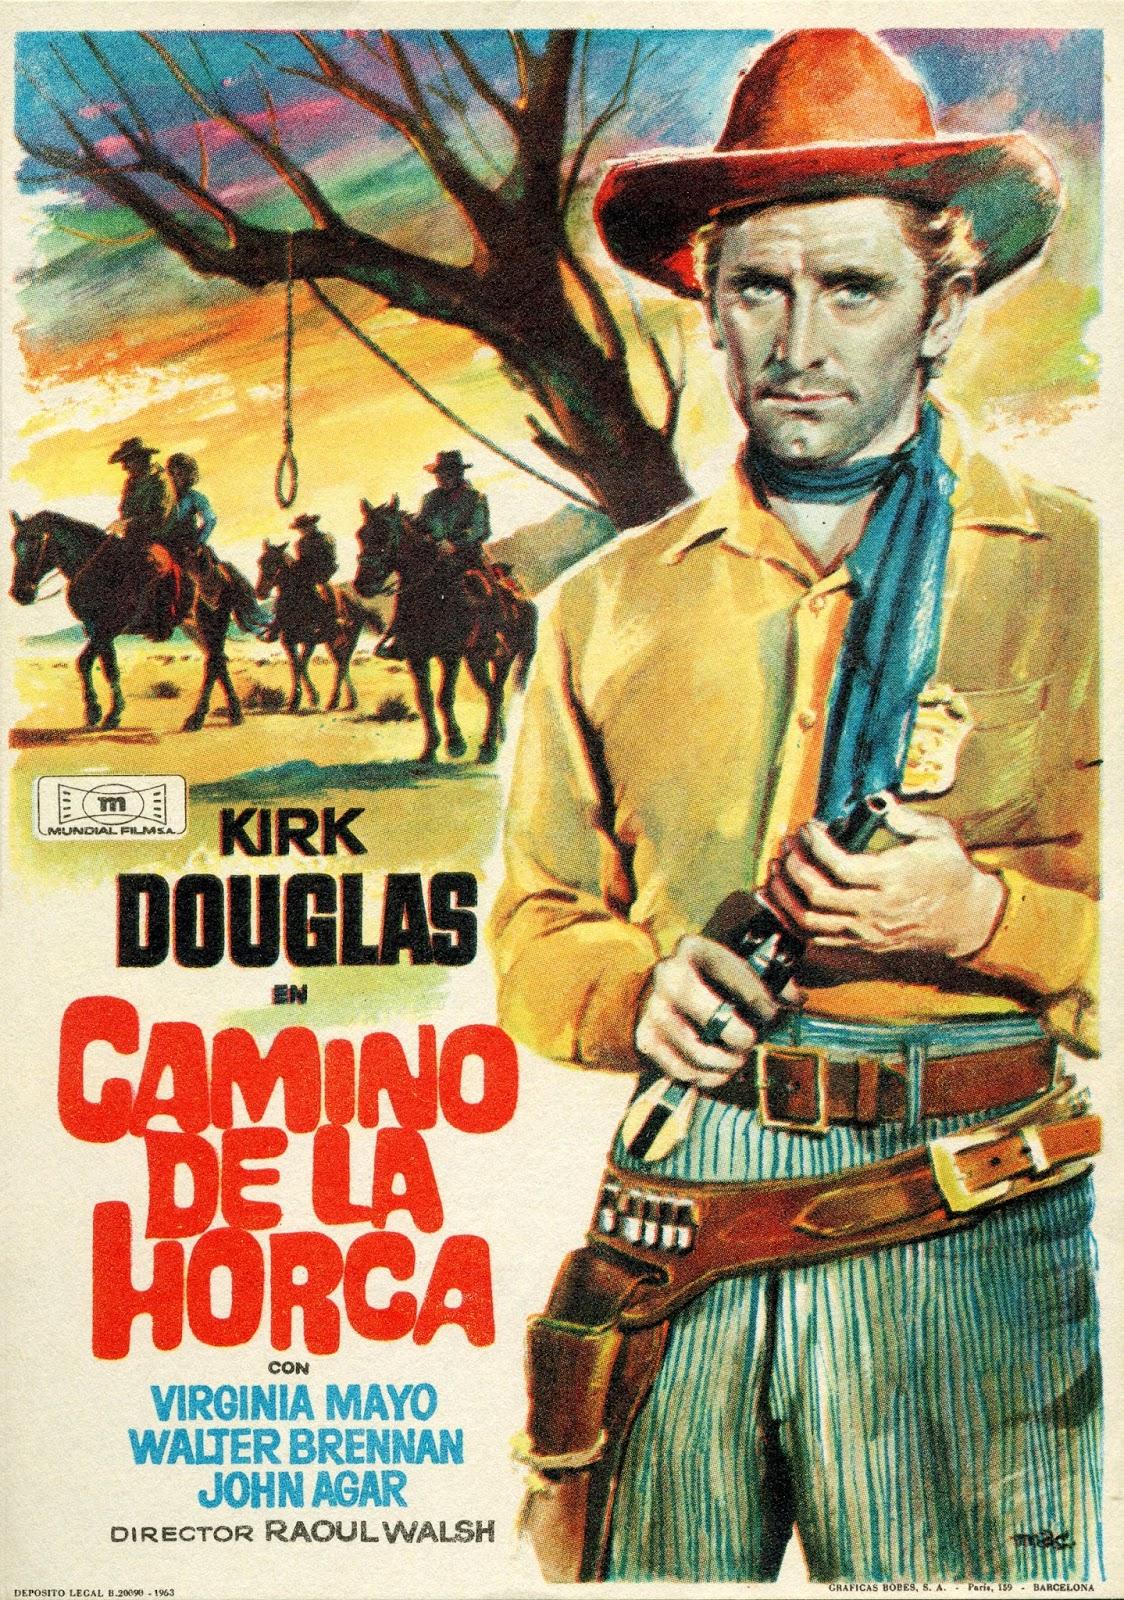 THE WEST IS THE BEST - Página 3 Camino+de+la+horca+cartel